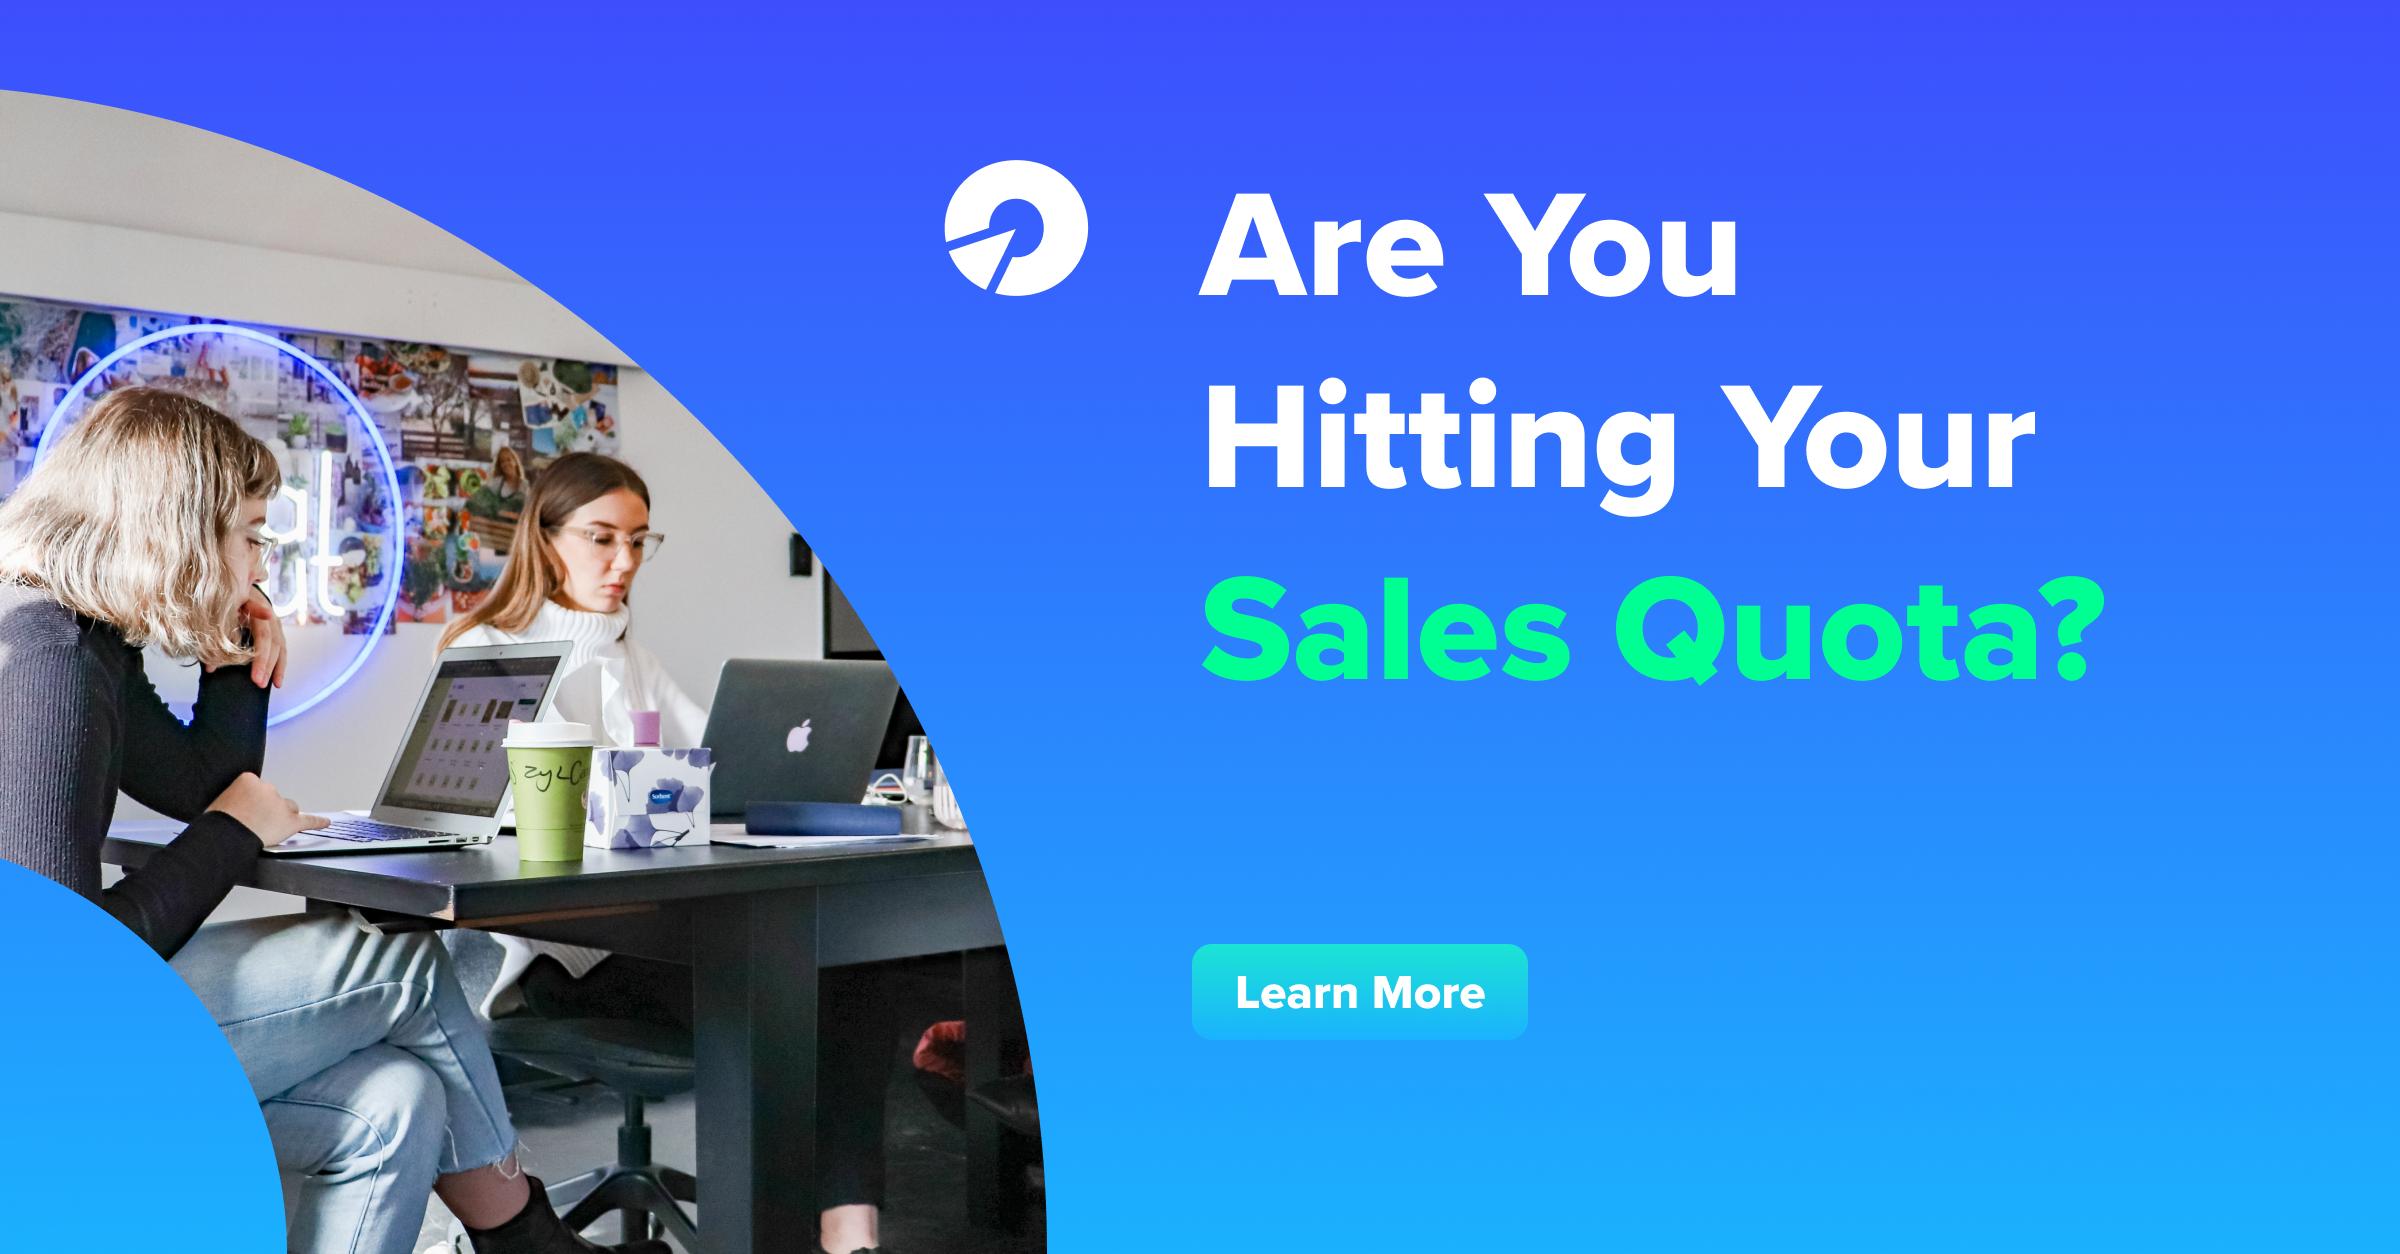 Hitting Your Sales Quota?